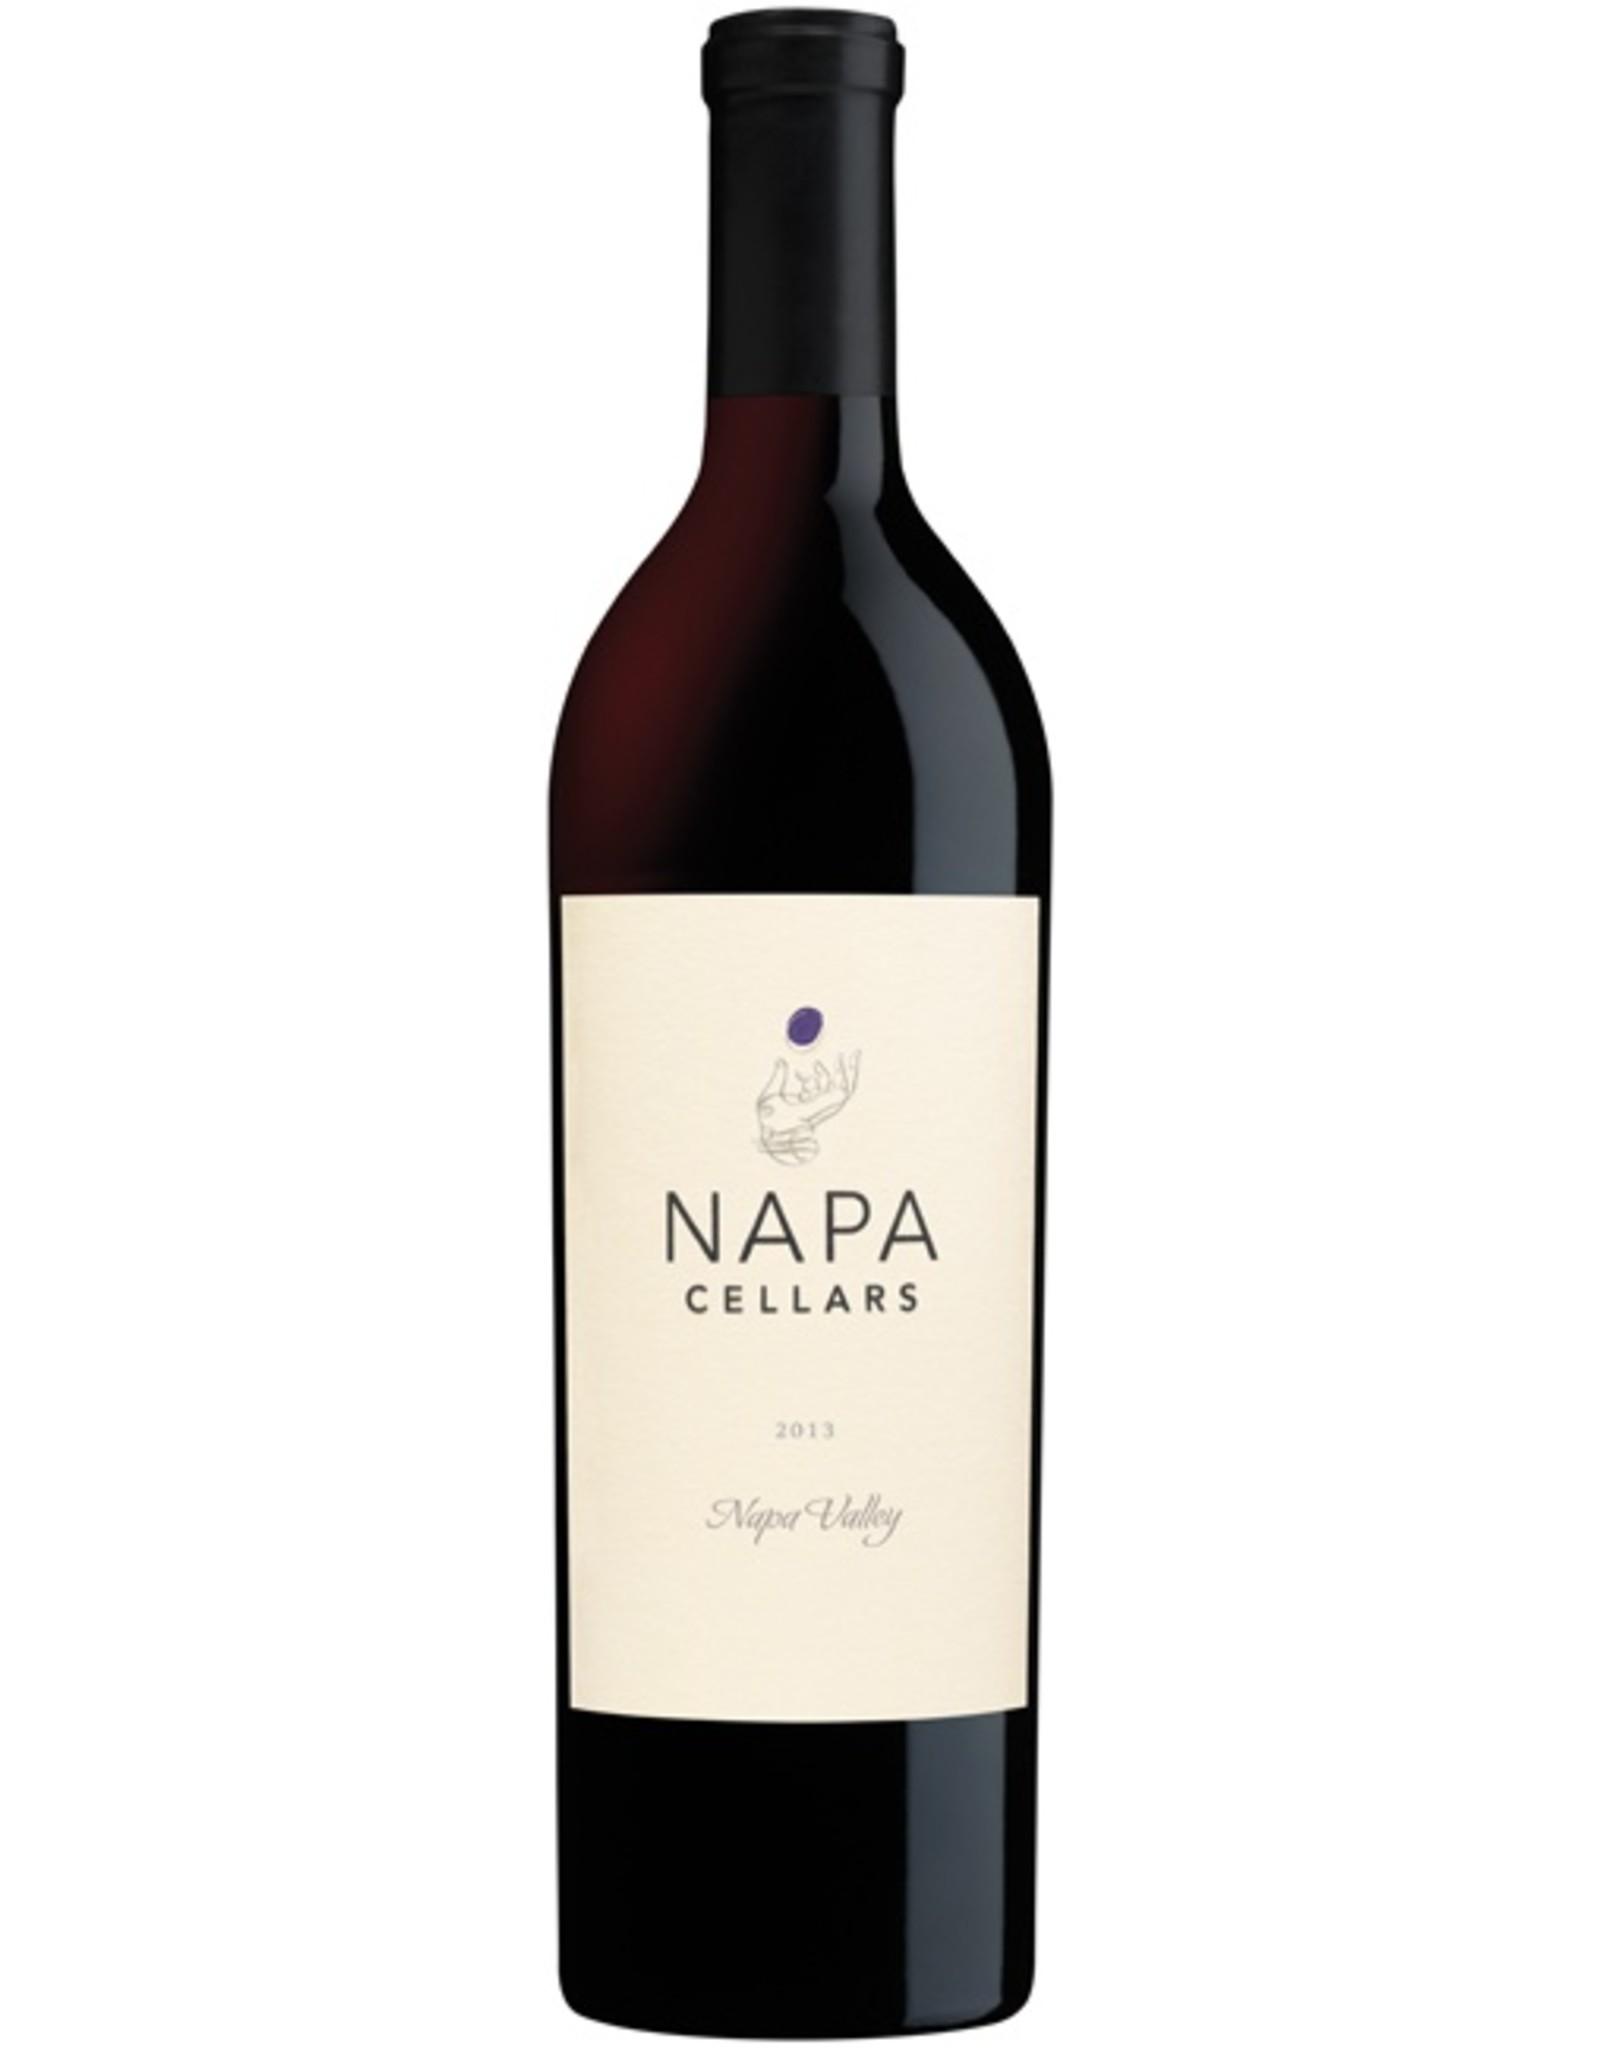 Red Wine 2013, Napa Cellars, Merlot, Oakville, Napa Valley, California, 13.9% Alc, CT89